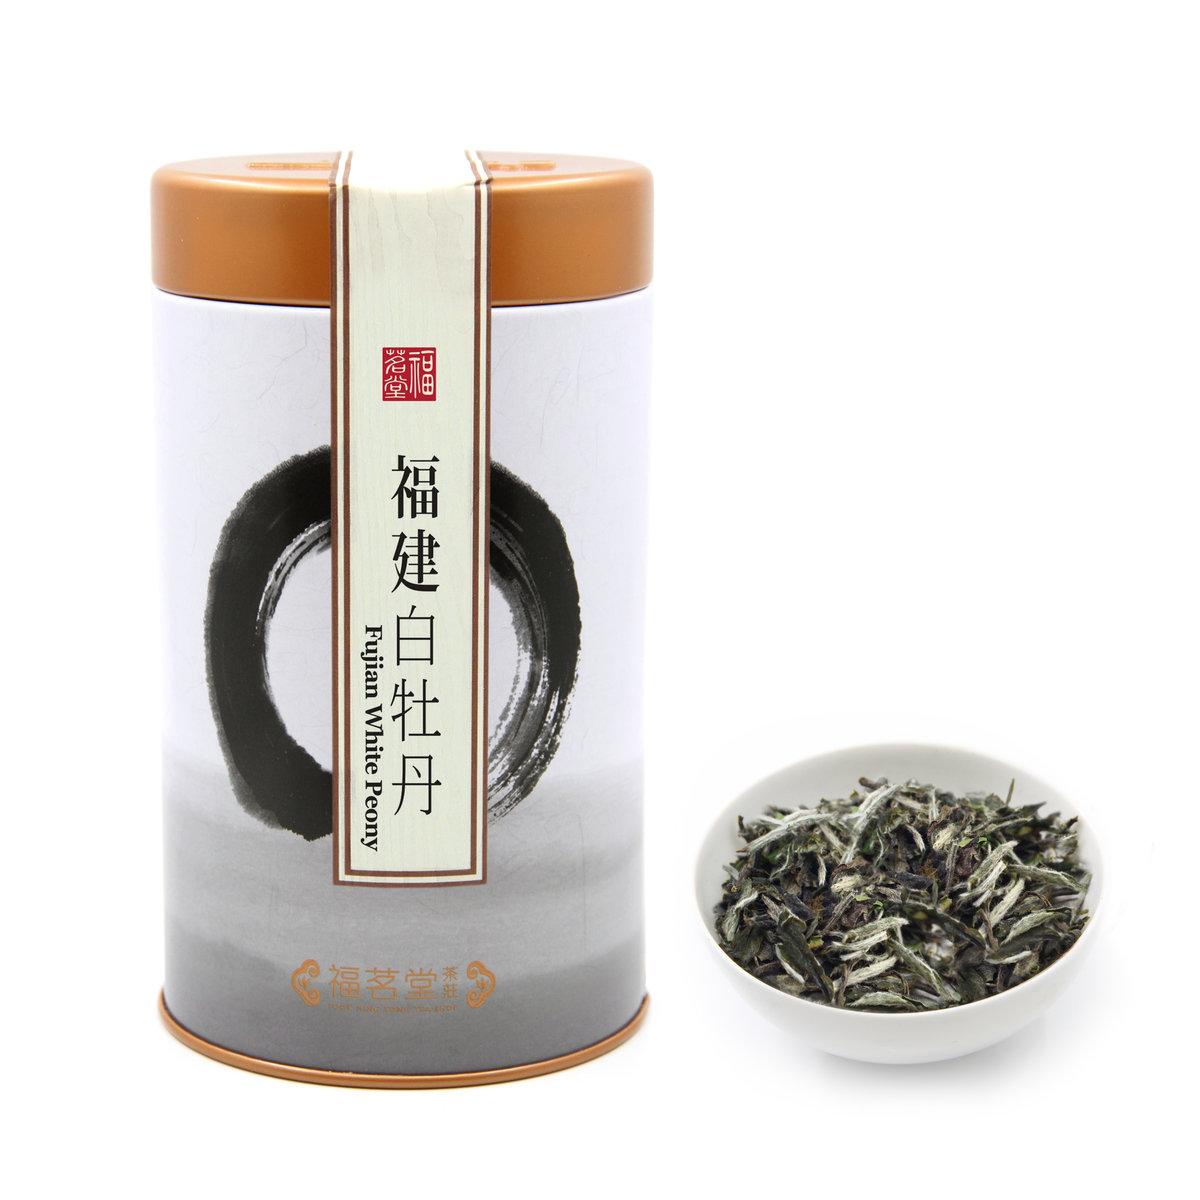 [FMT Series-Tranquility] Fujian White Peony (Tin)